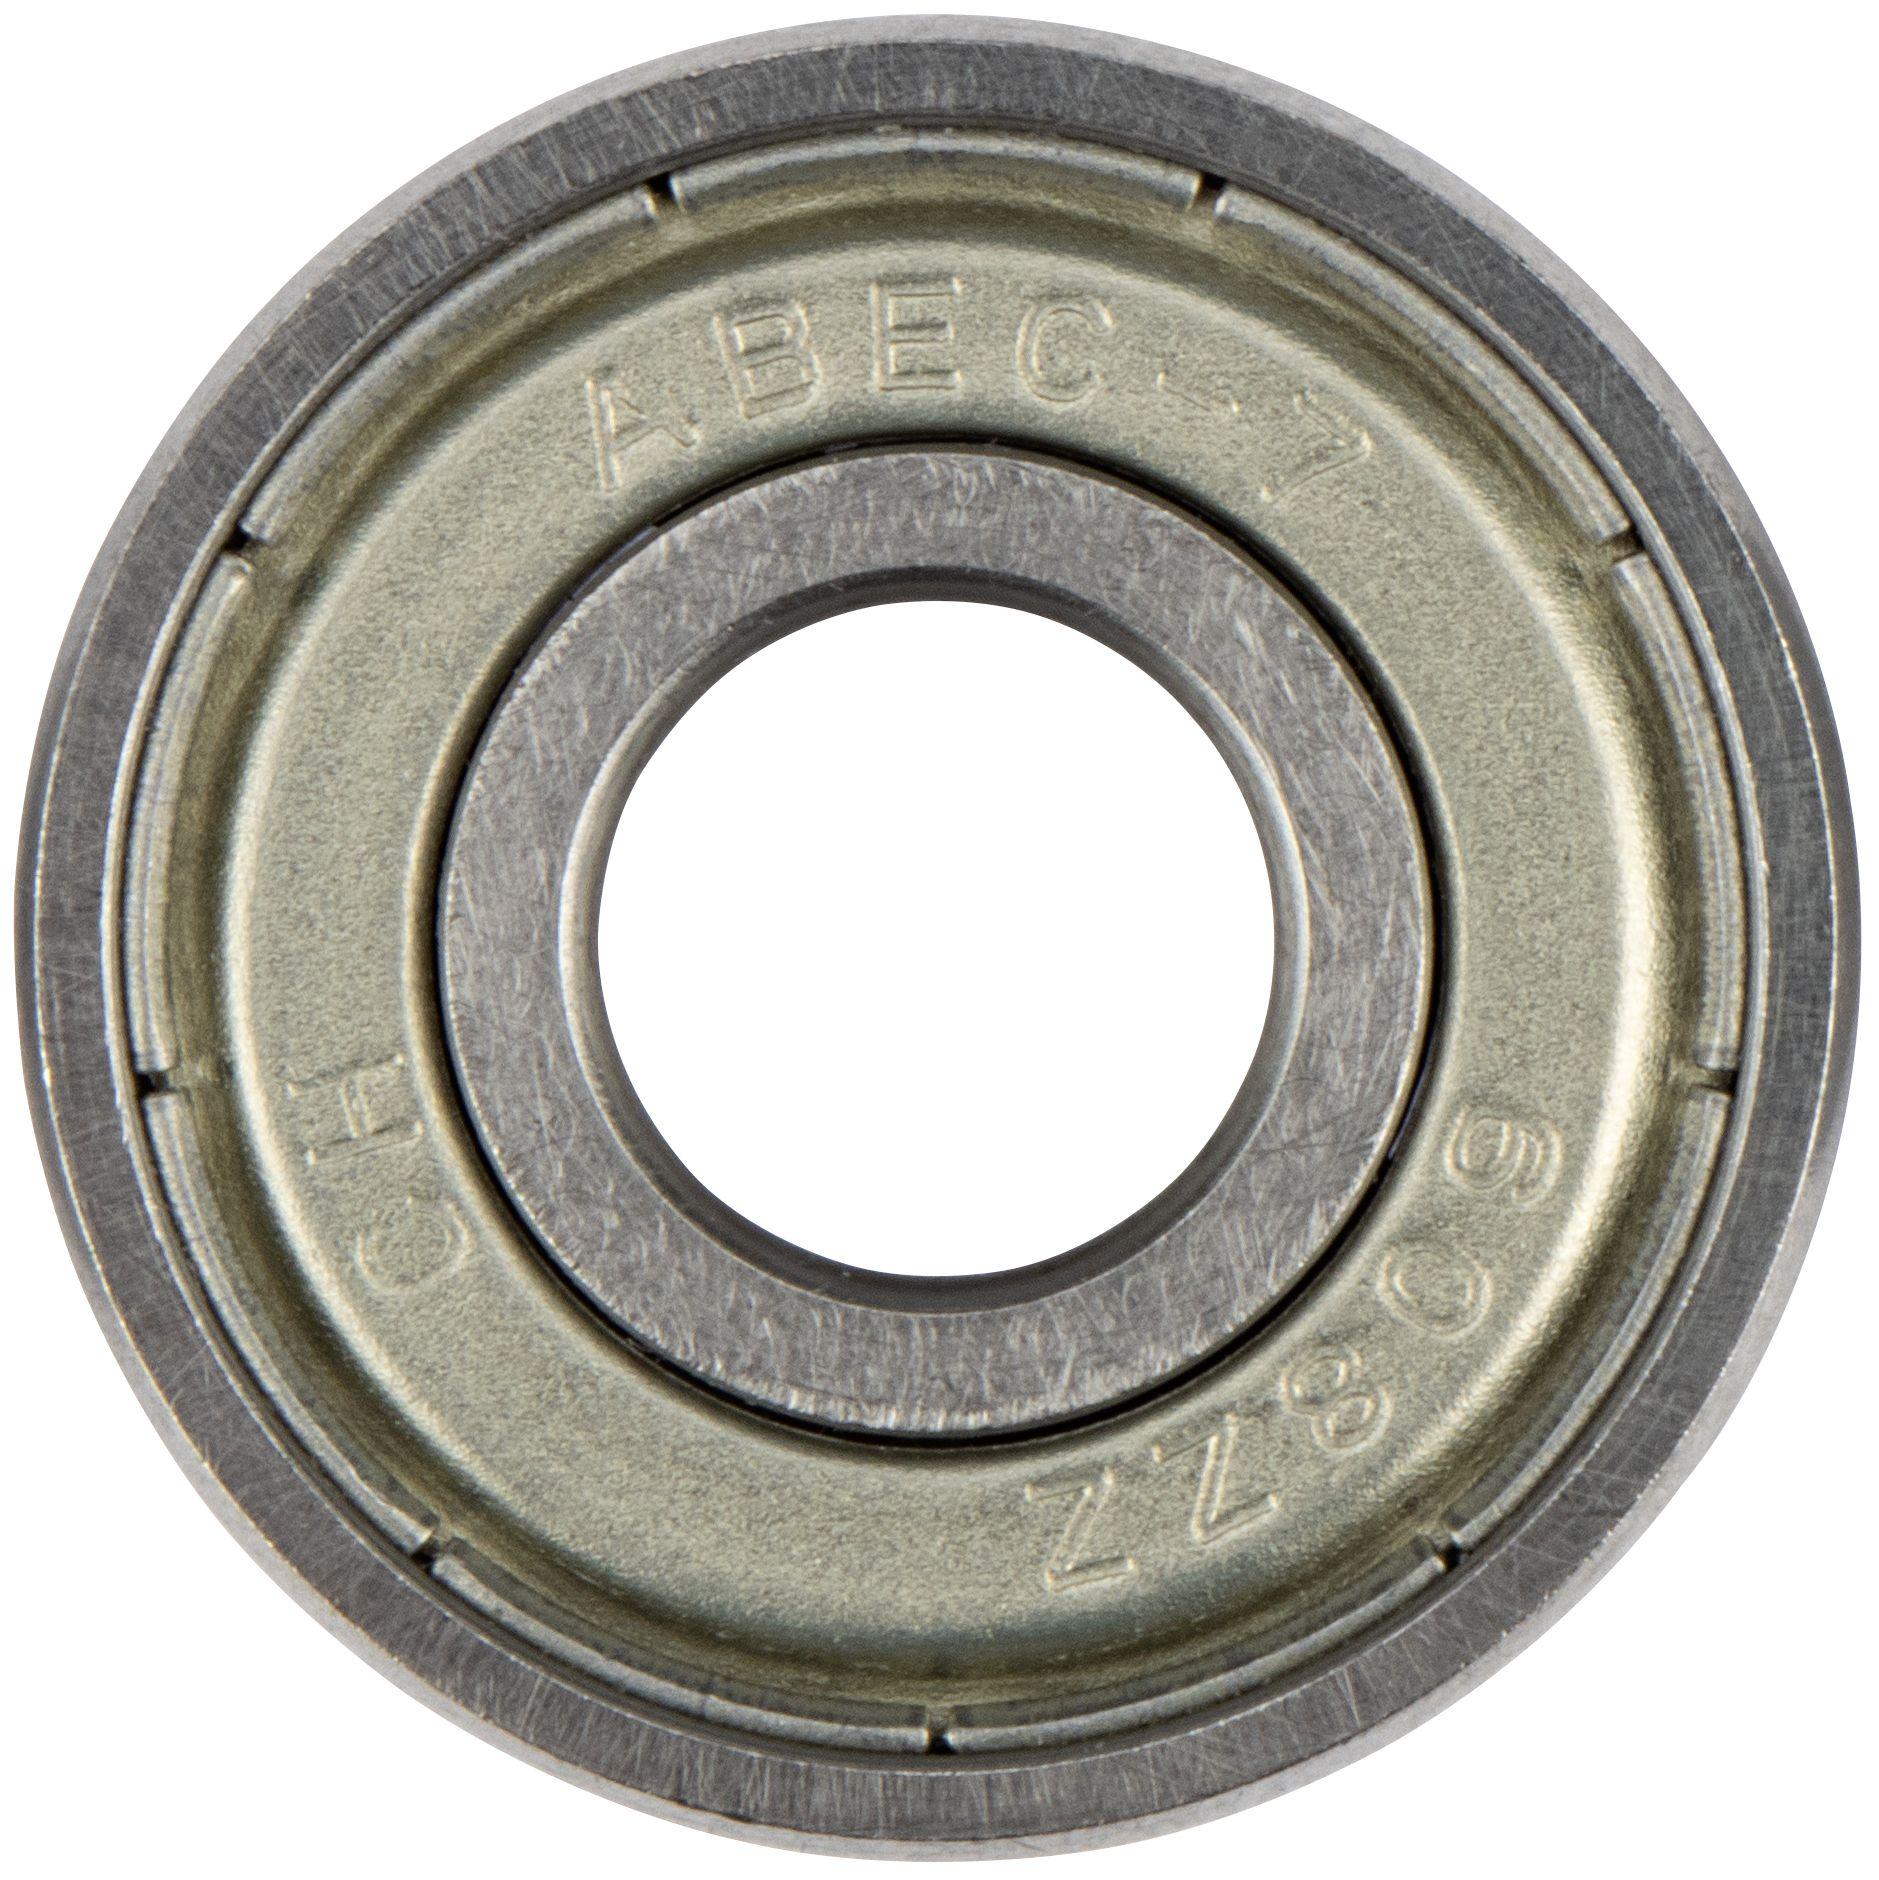 52LJ-ABEC7-LAGER